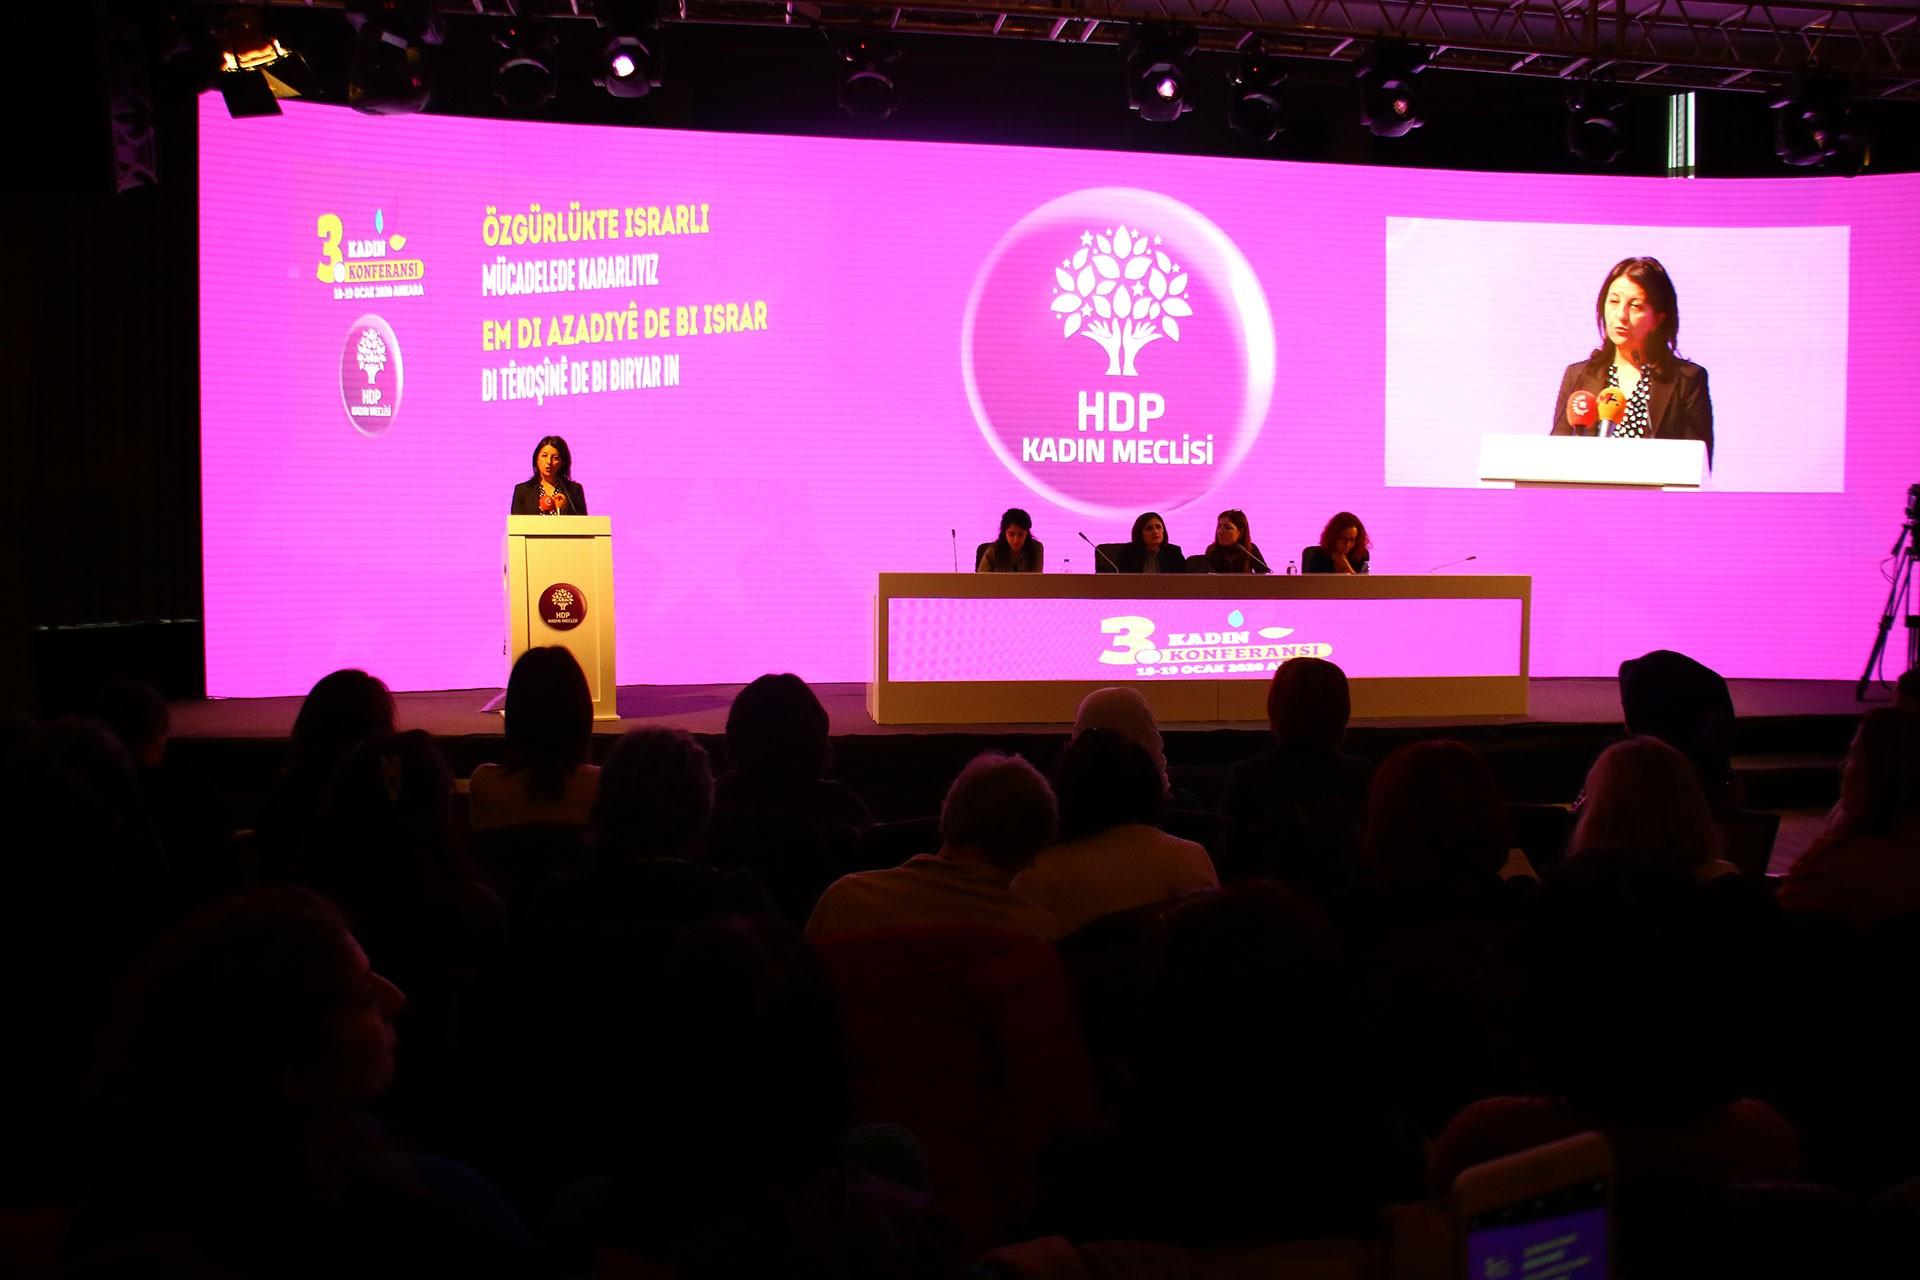 Pervin Buldan konferansta konuşuyor.